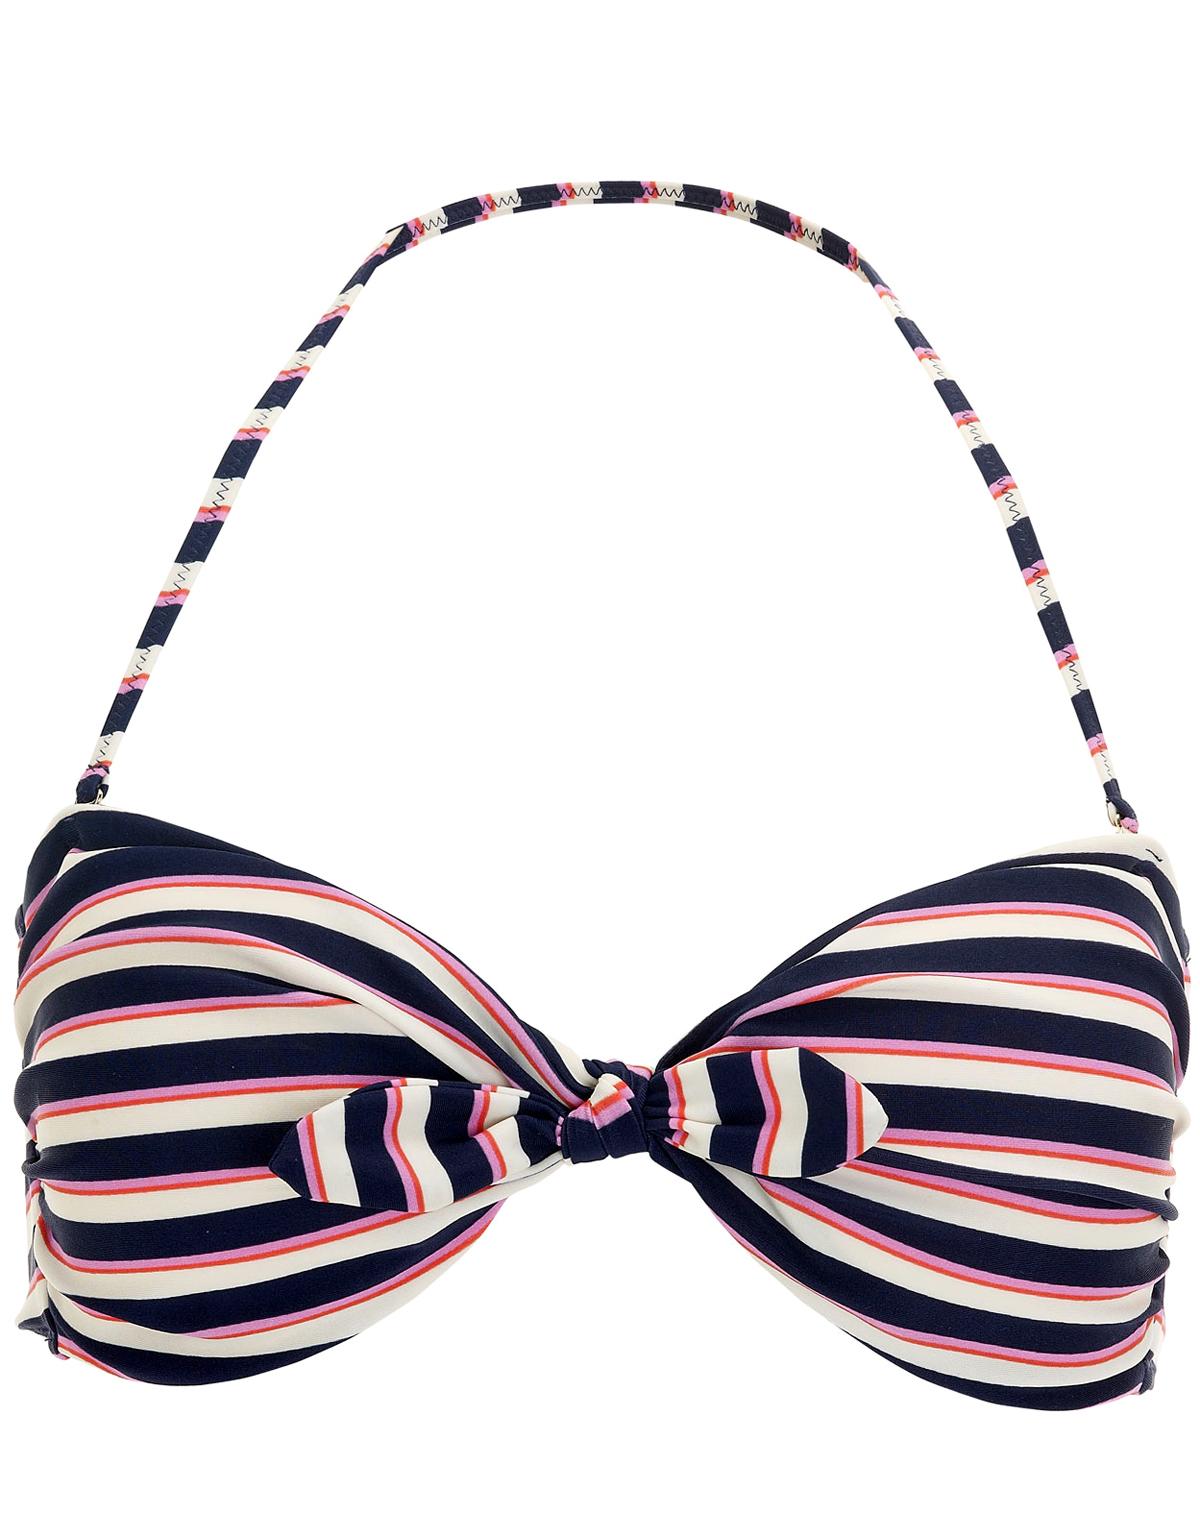 Accessor1ze BLUE Nautical Twist Bow Knot  Bandeau Bikini Top - Size 8 to 18